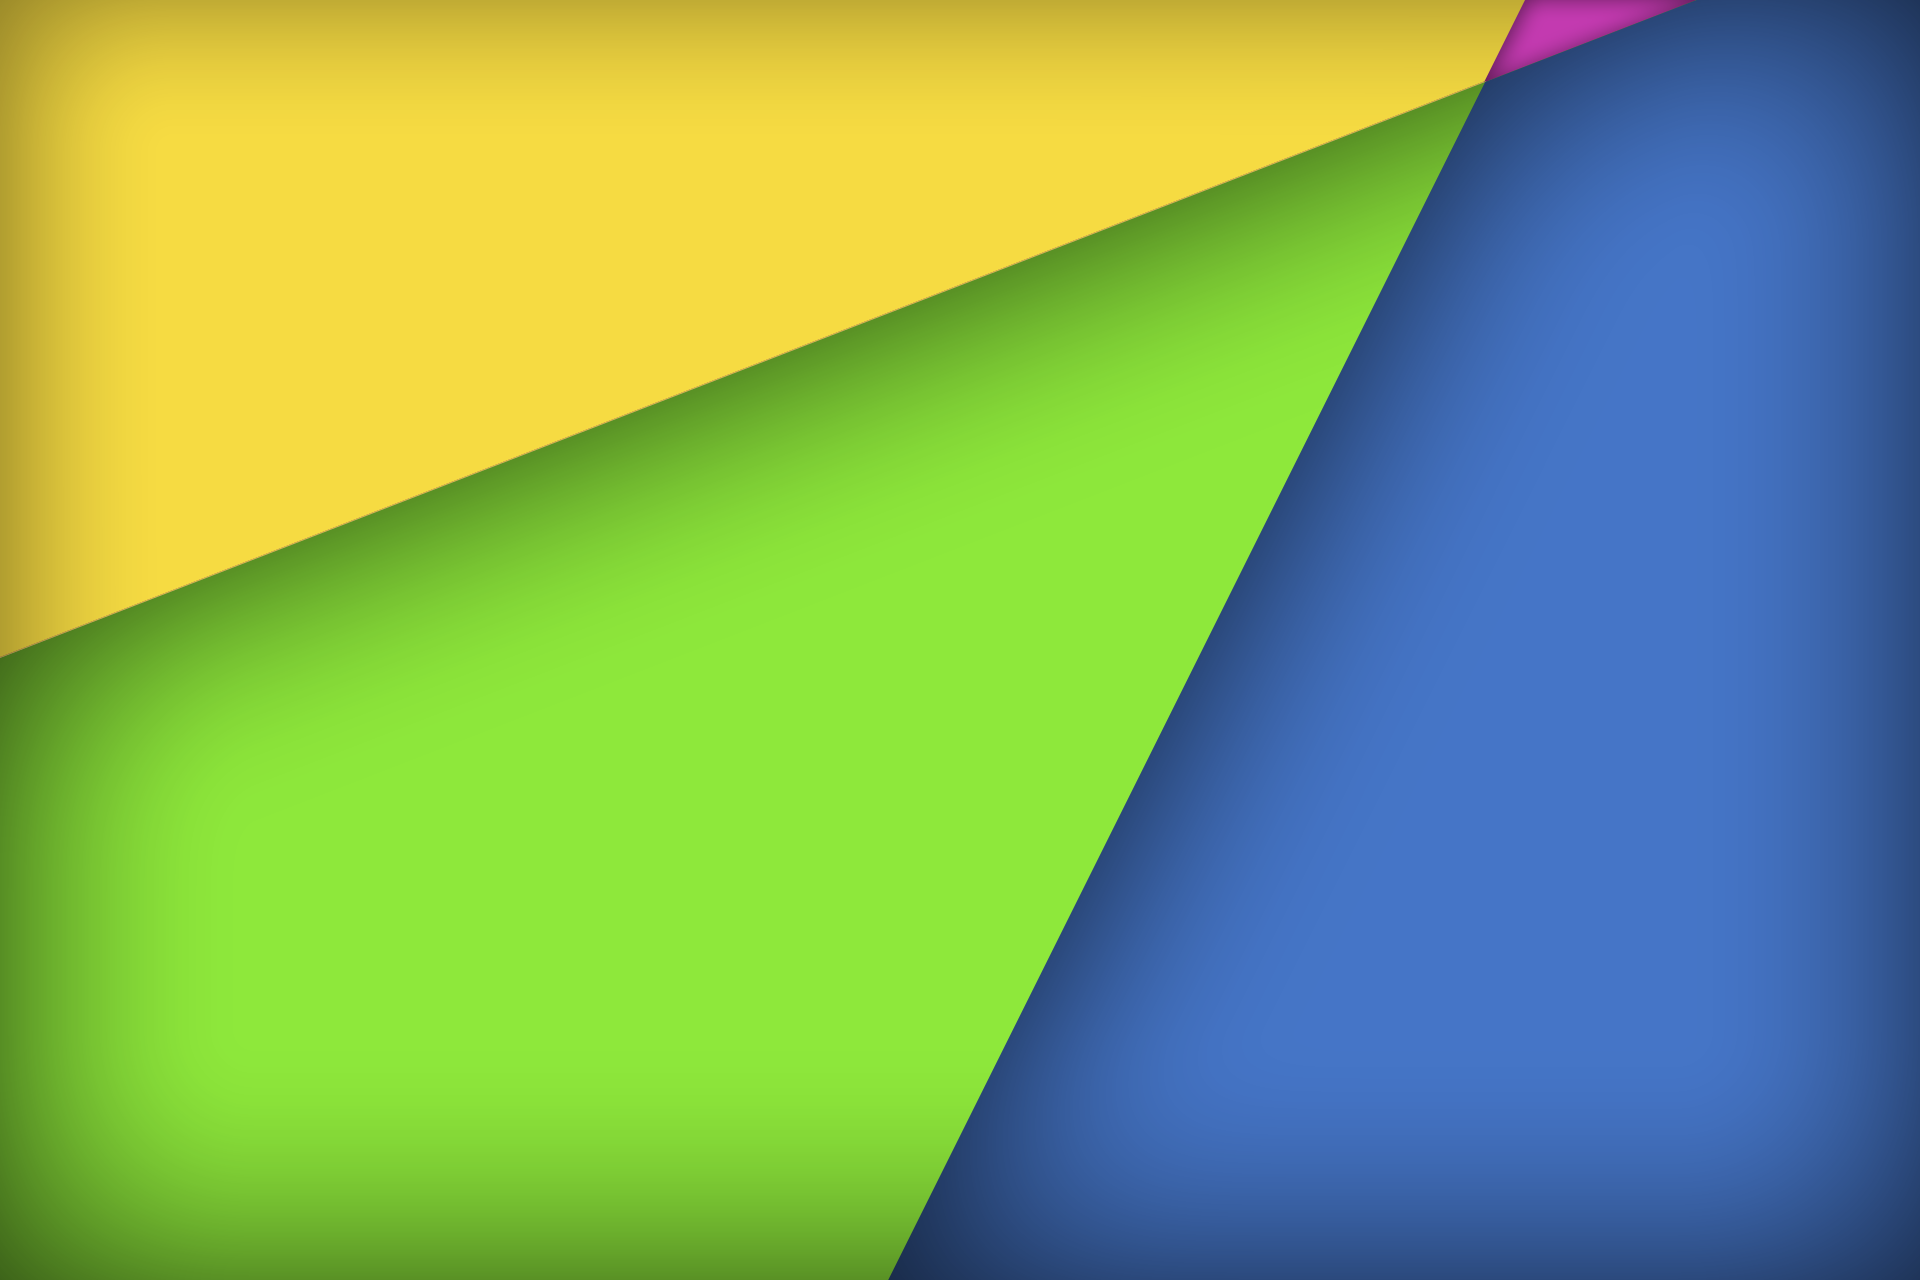 Nexus Wallpaper 25   WallpaperCanyon 1920x1280